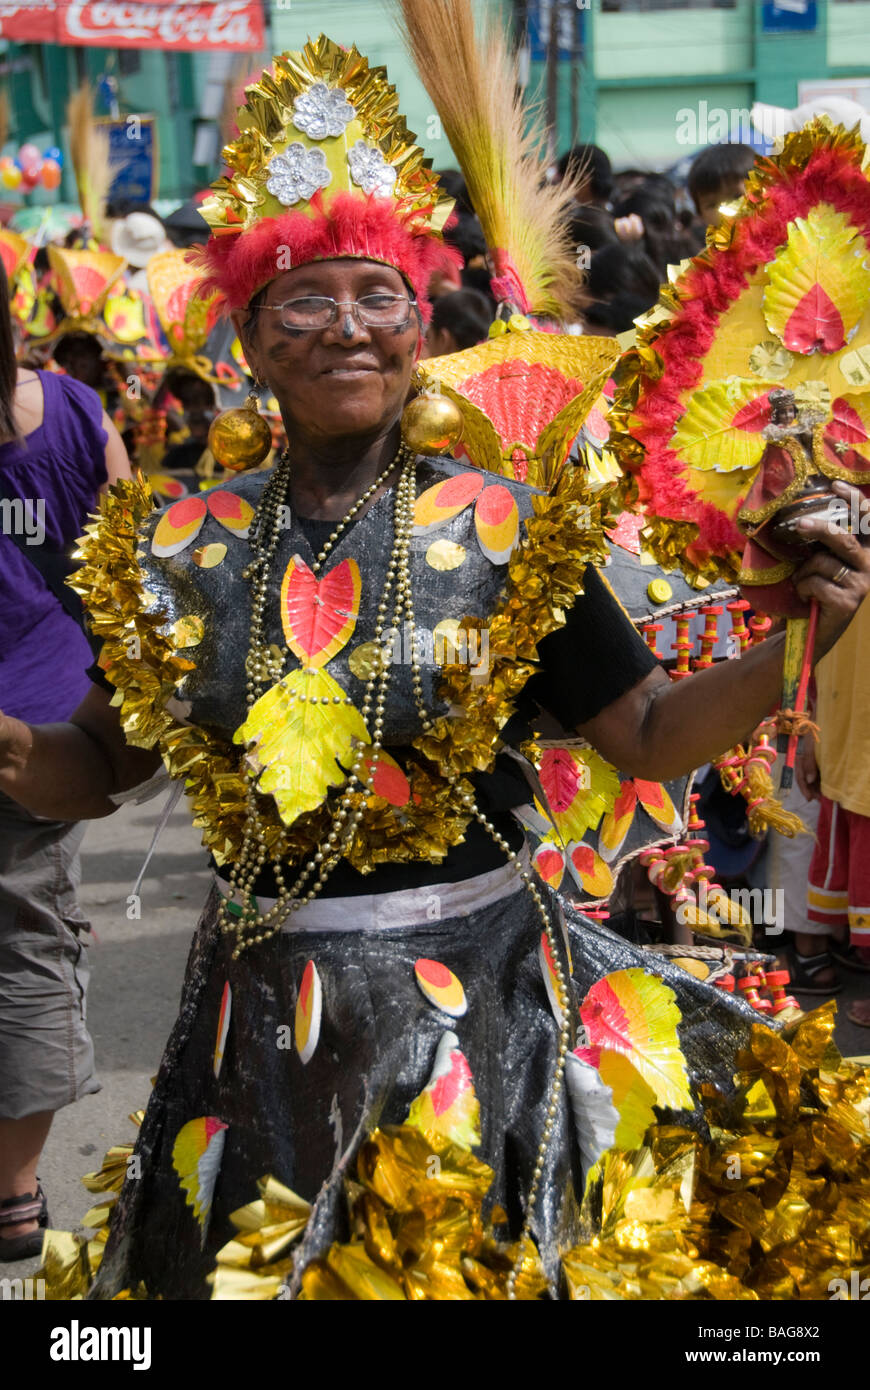 Reveller in costume at the Ati-Atihan festival in Kalibo, Philippines - Stock Image